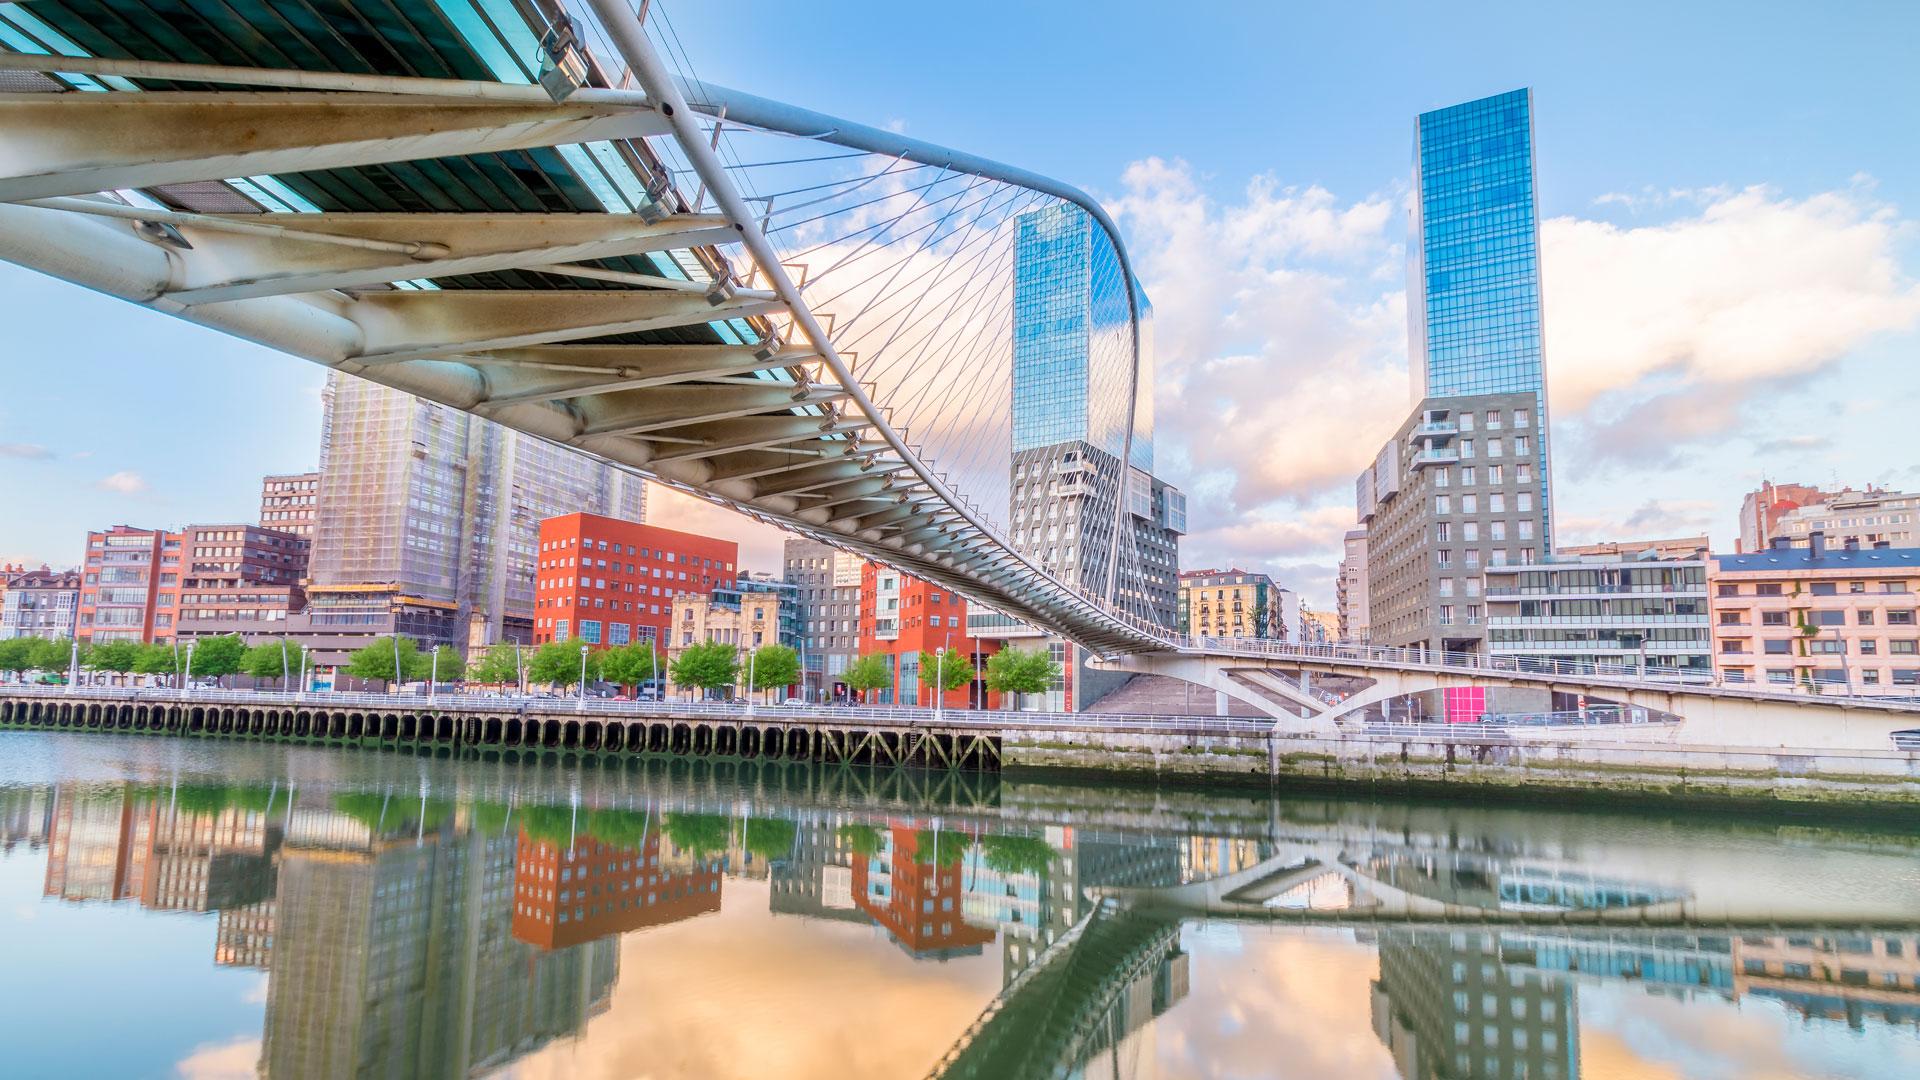 Ciudades Lexus Bilbao hero asset